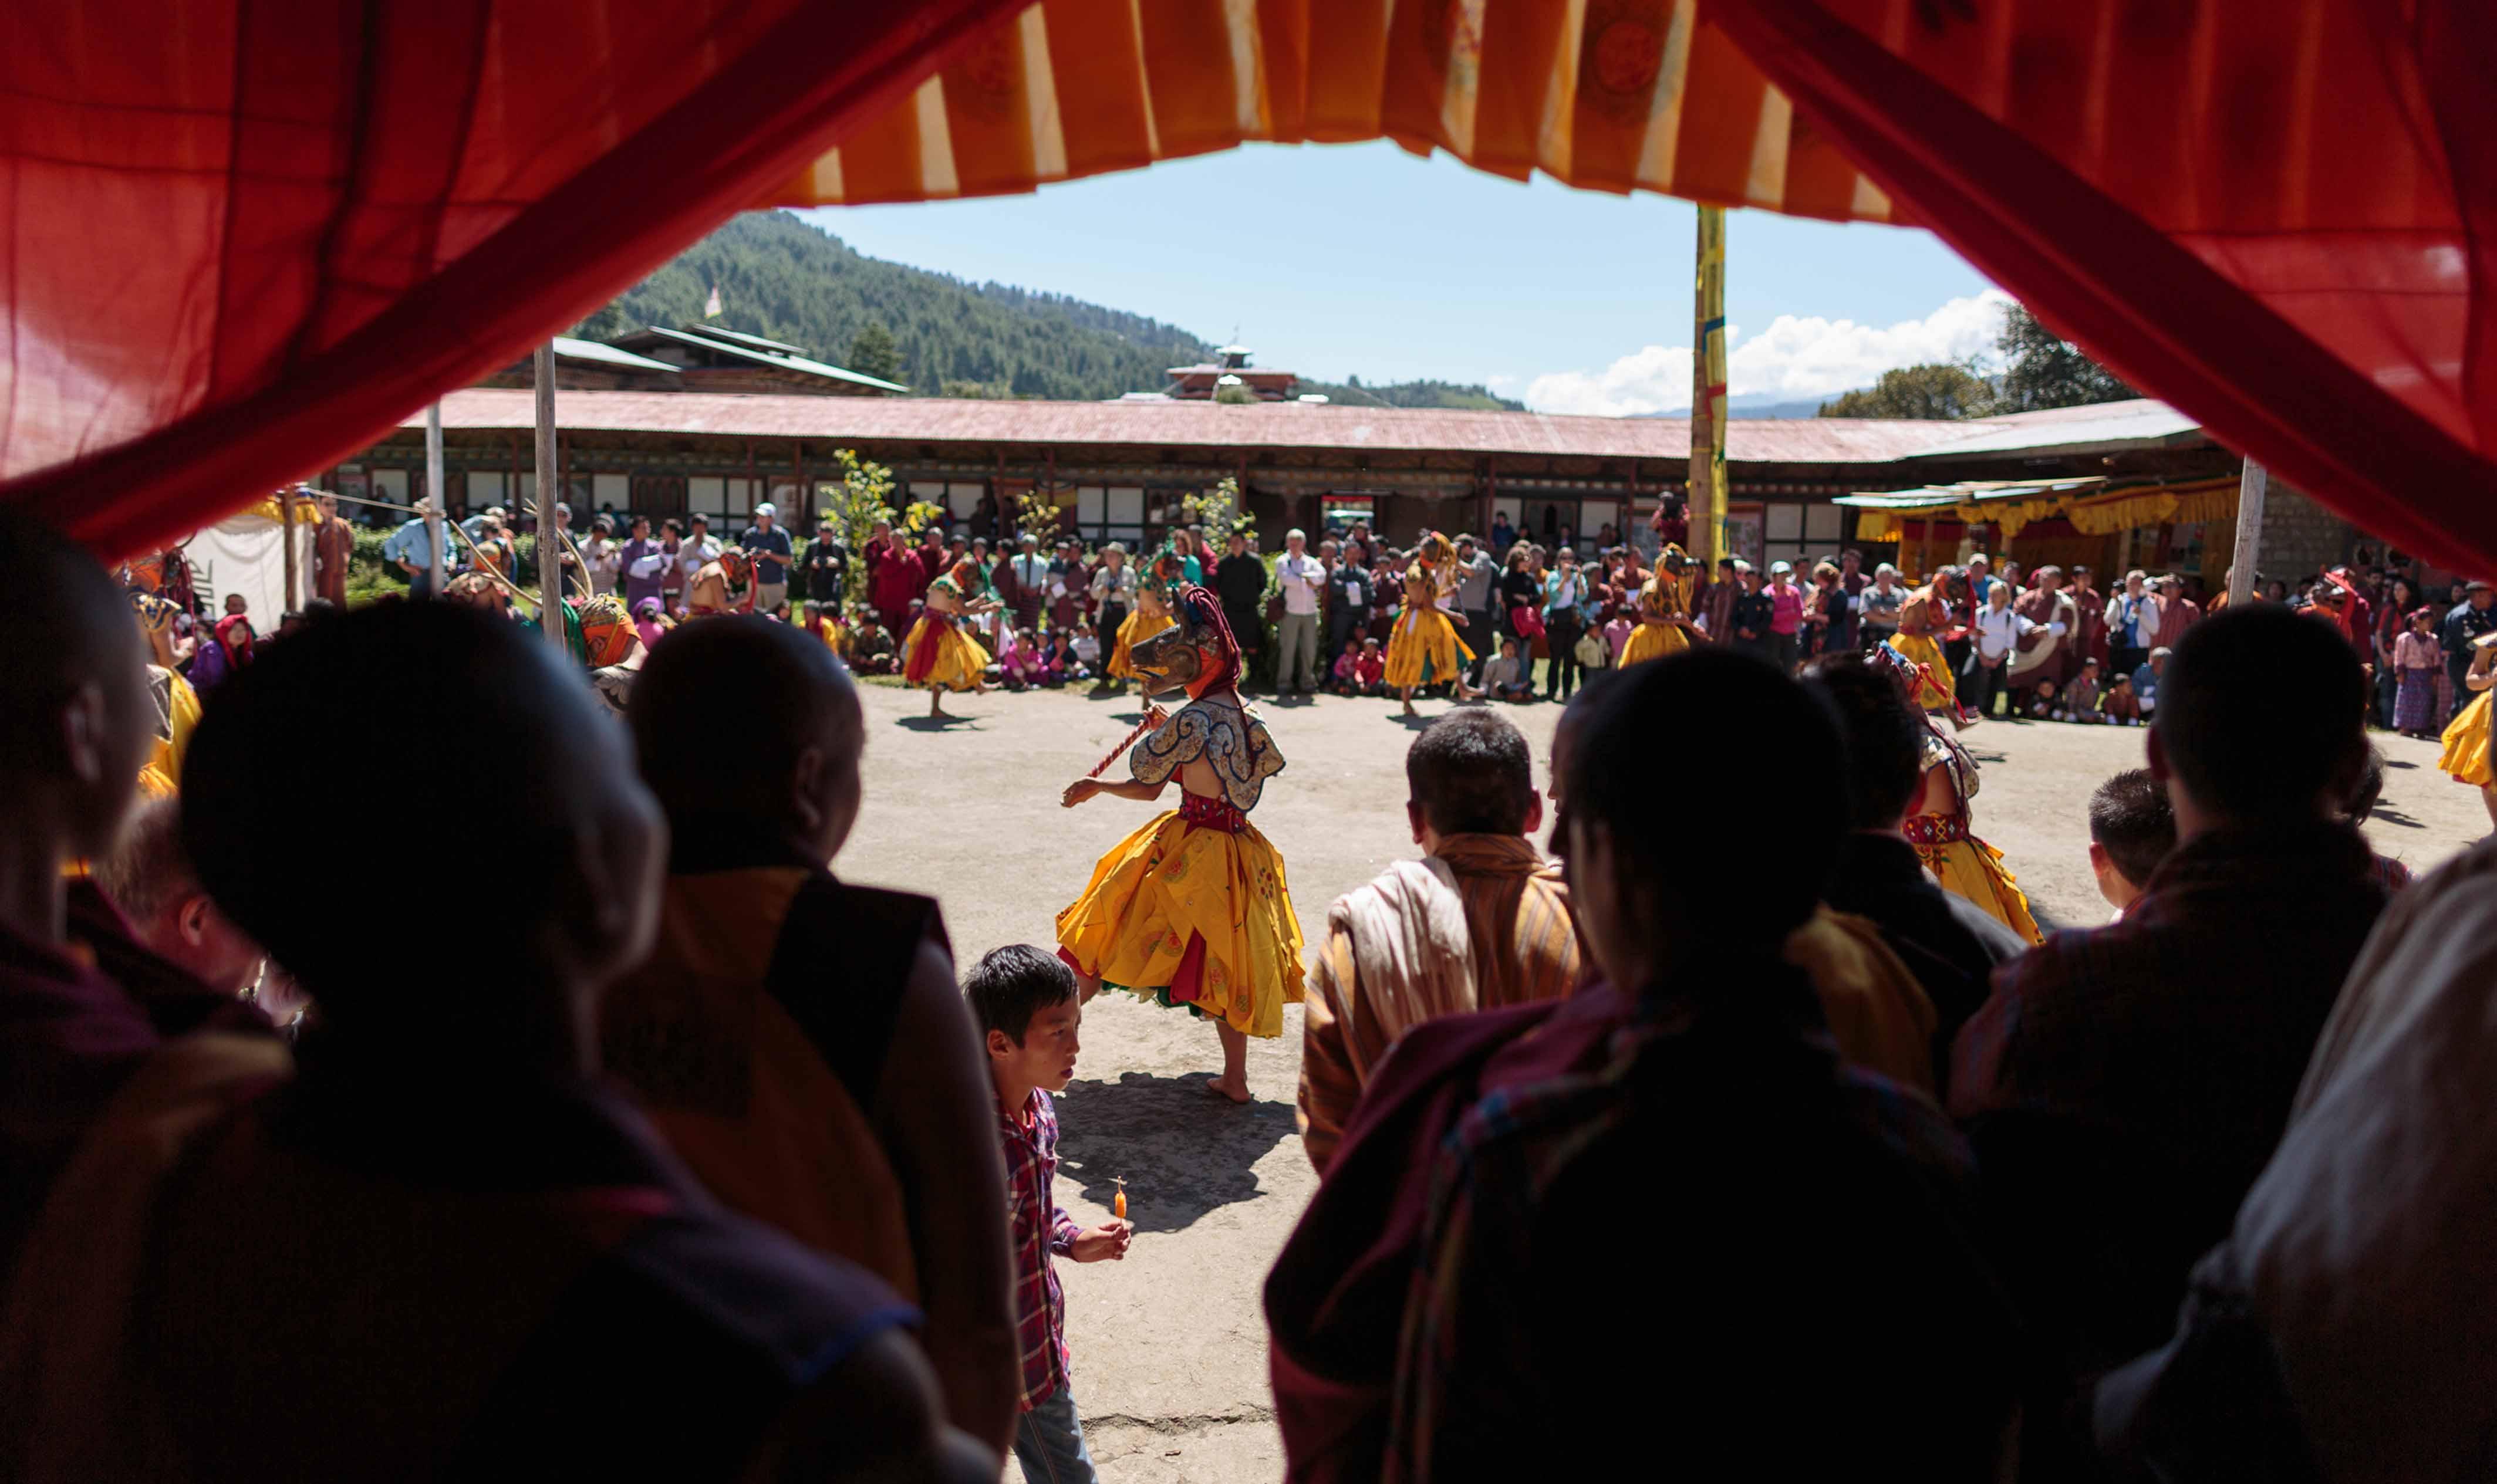 Tamshing Phala Chhoepa Festival – 26 to 28 Sept, 2020